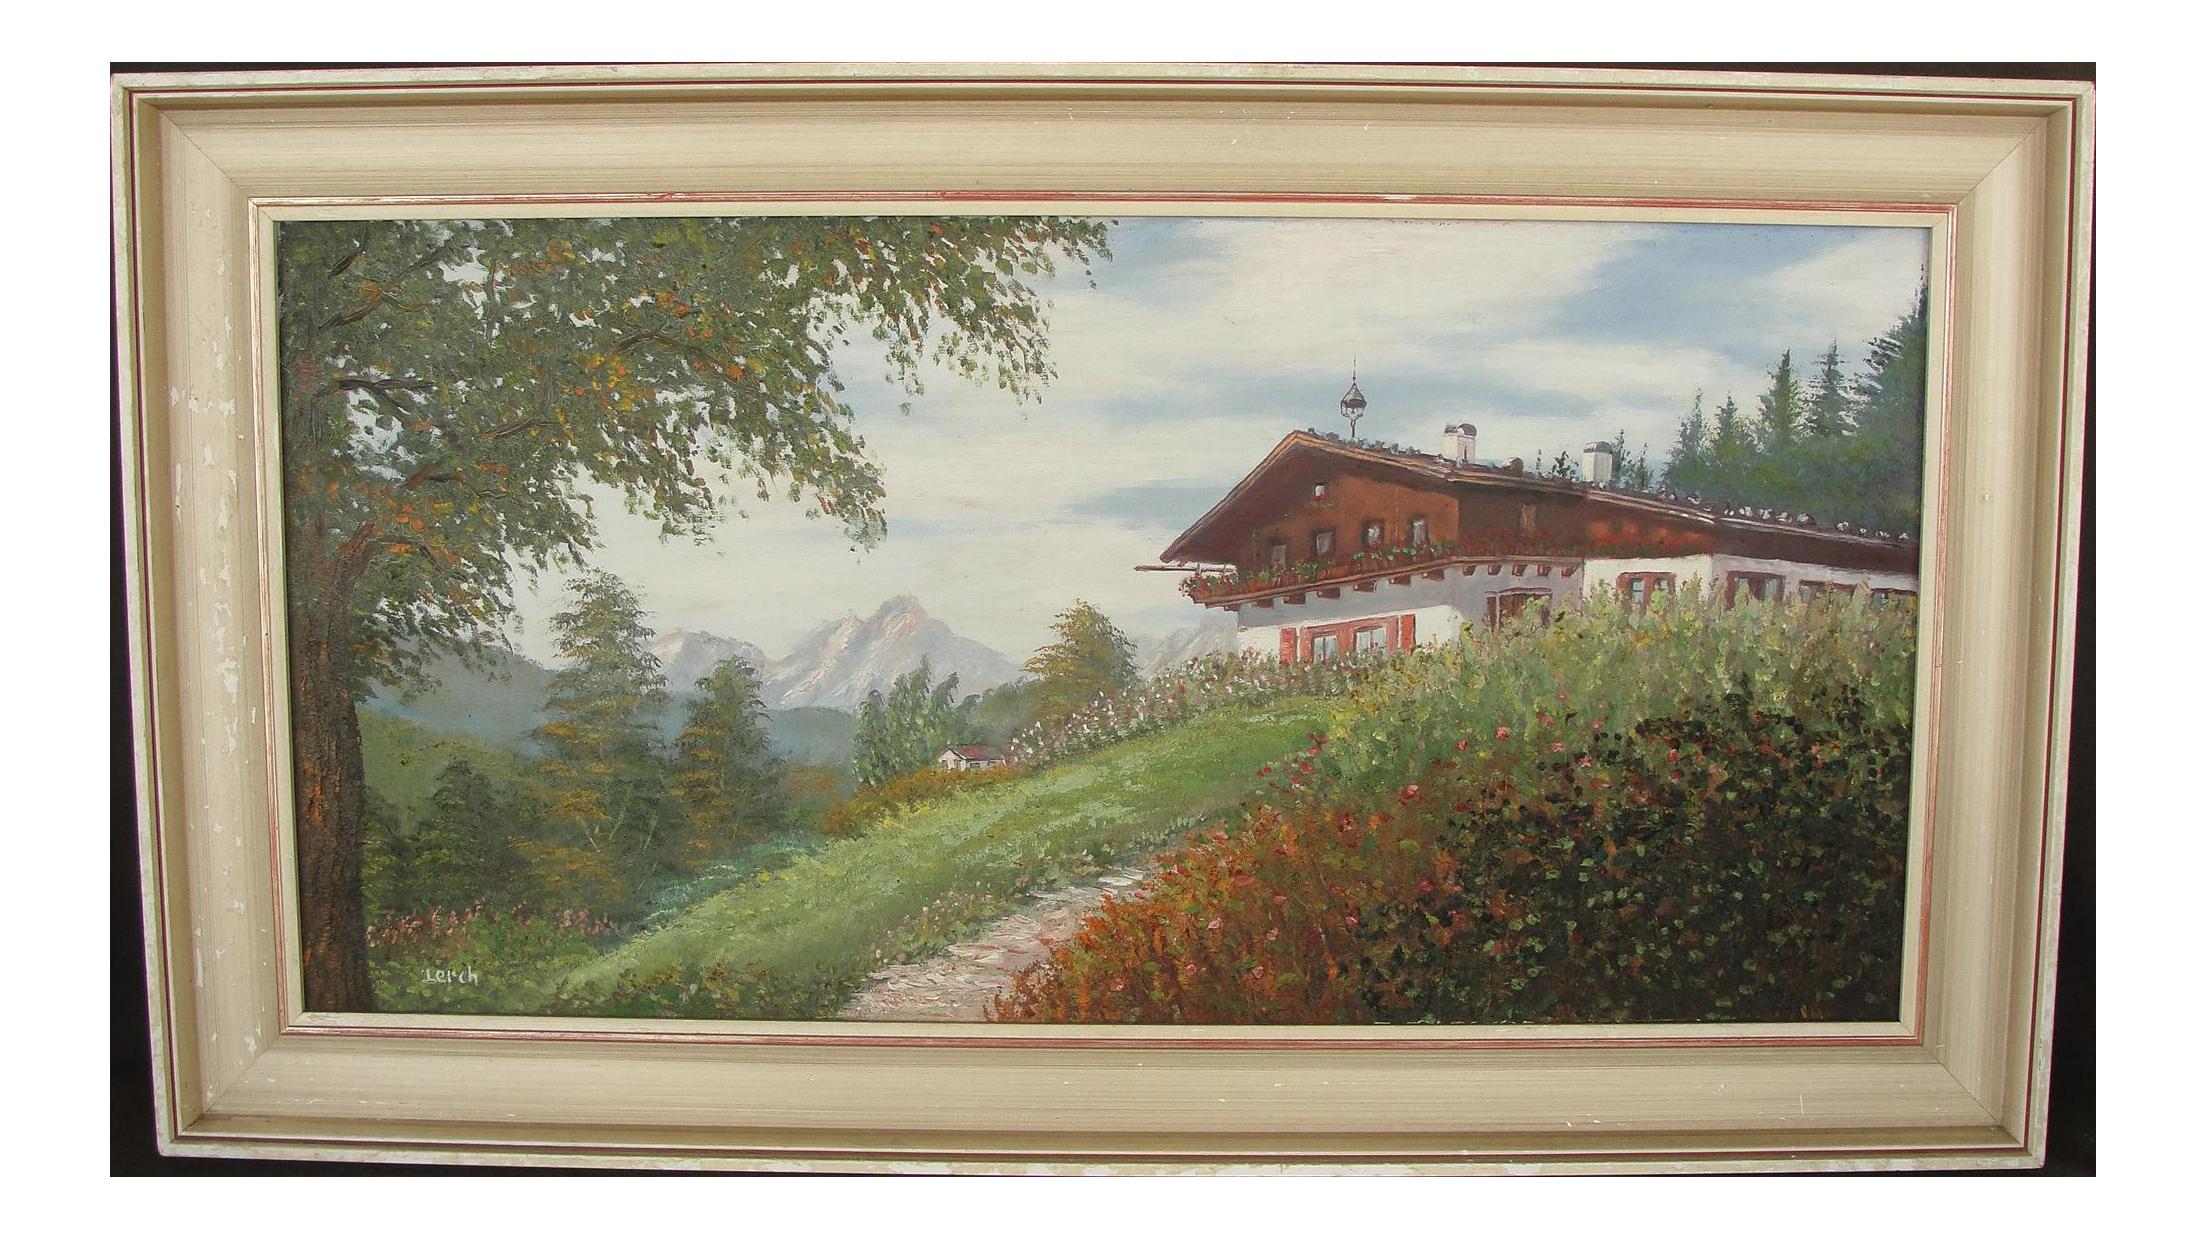 Vintage Mountain Chalet German Landscape Oil Painting On Chairish Com Oil Painting Landscape Painting Landscape Paintings